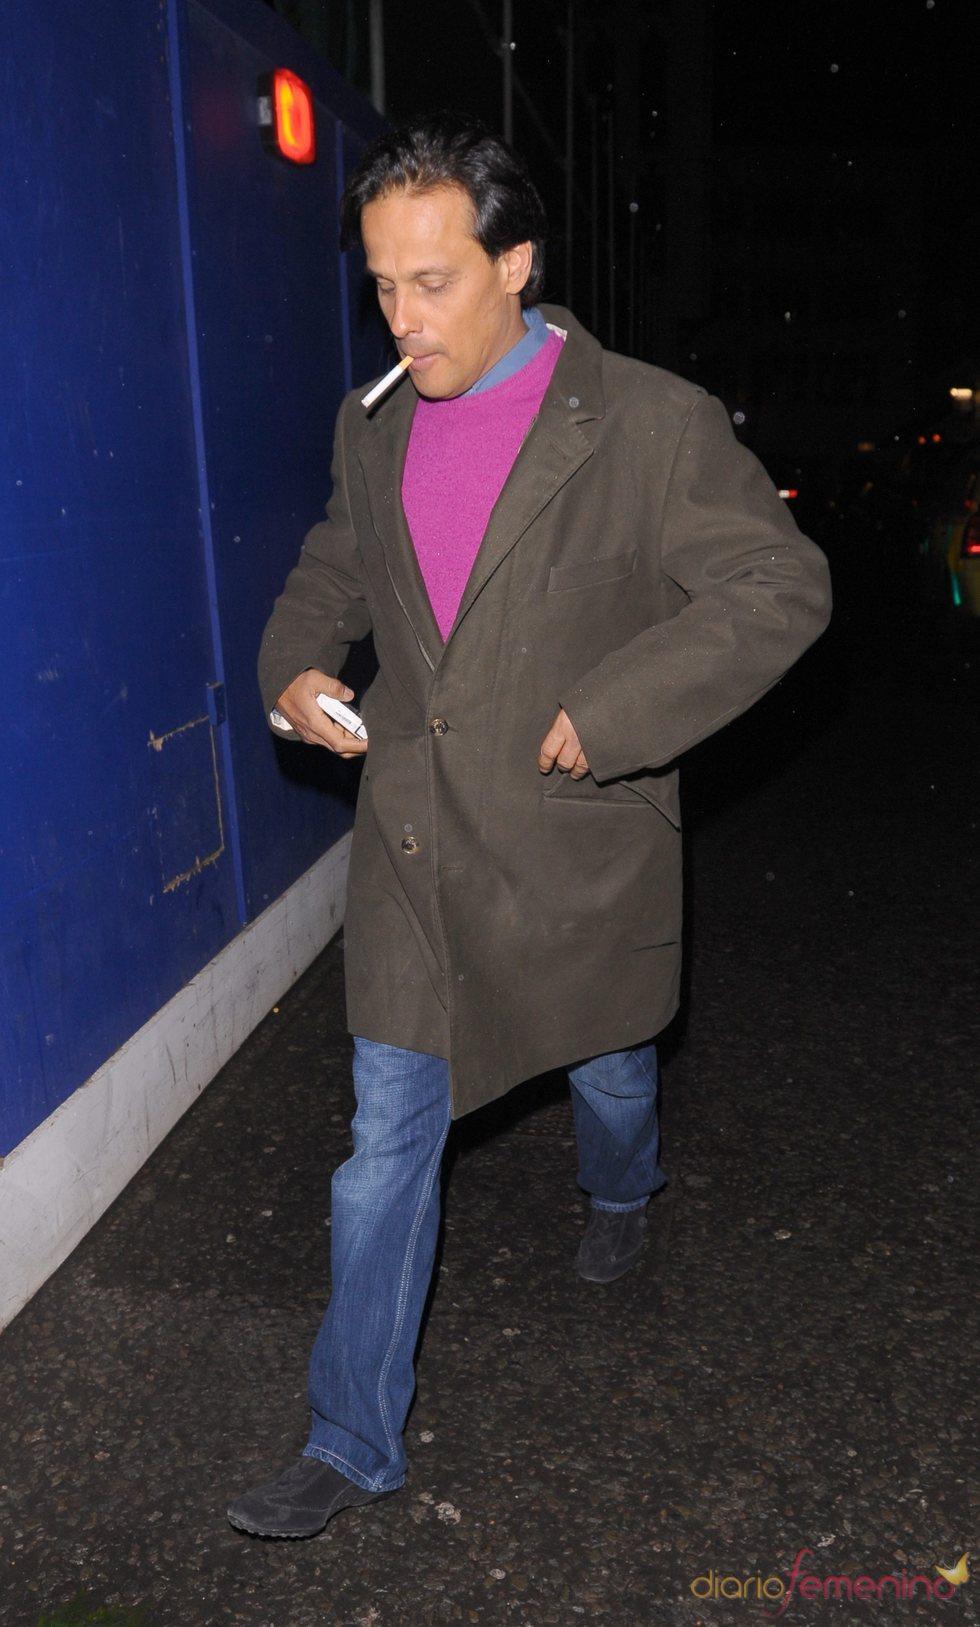 Arun Nayar, ex marido de Liz Hurley, fumando